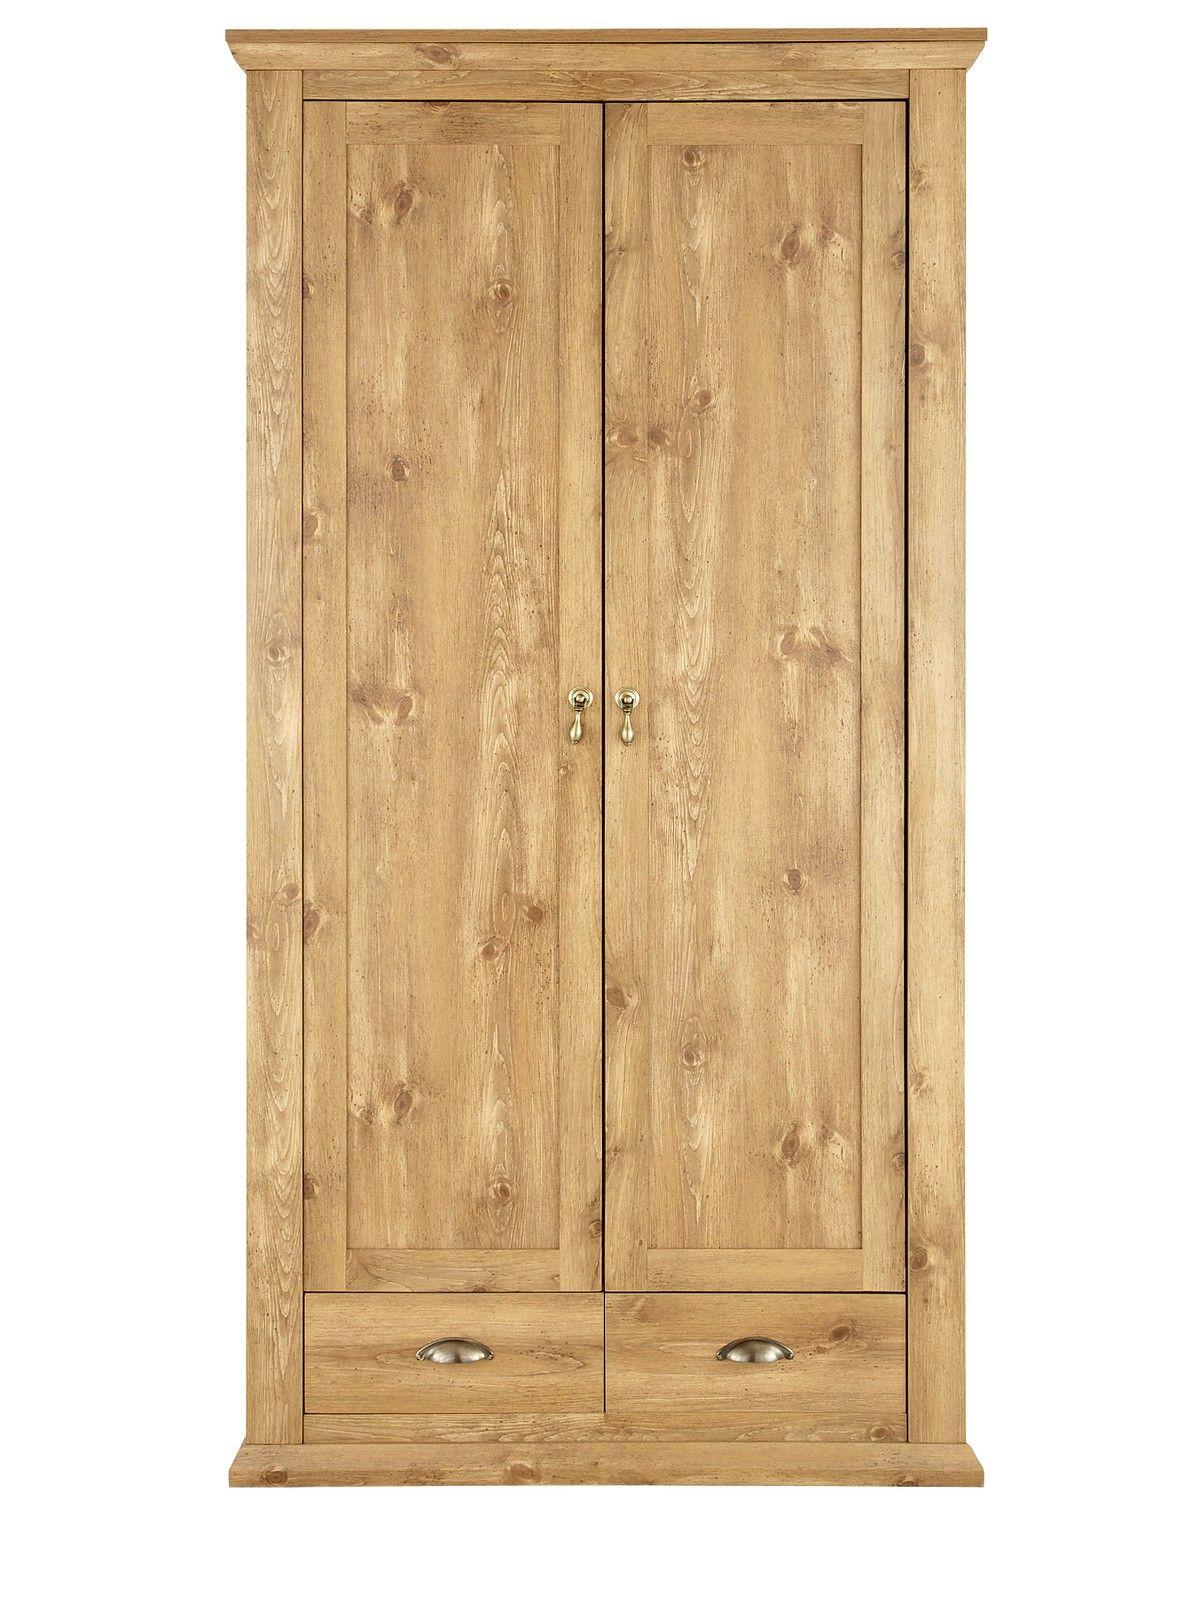 Pax Wardrobe With Sliding Doors Pax Malm Birch Birch Effect